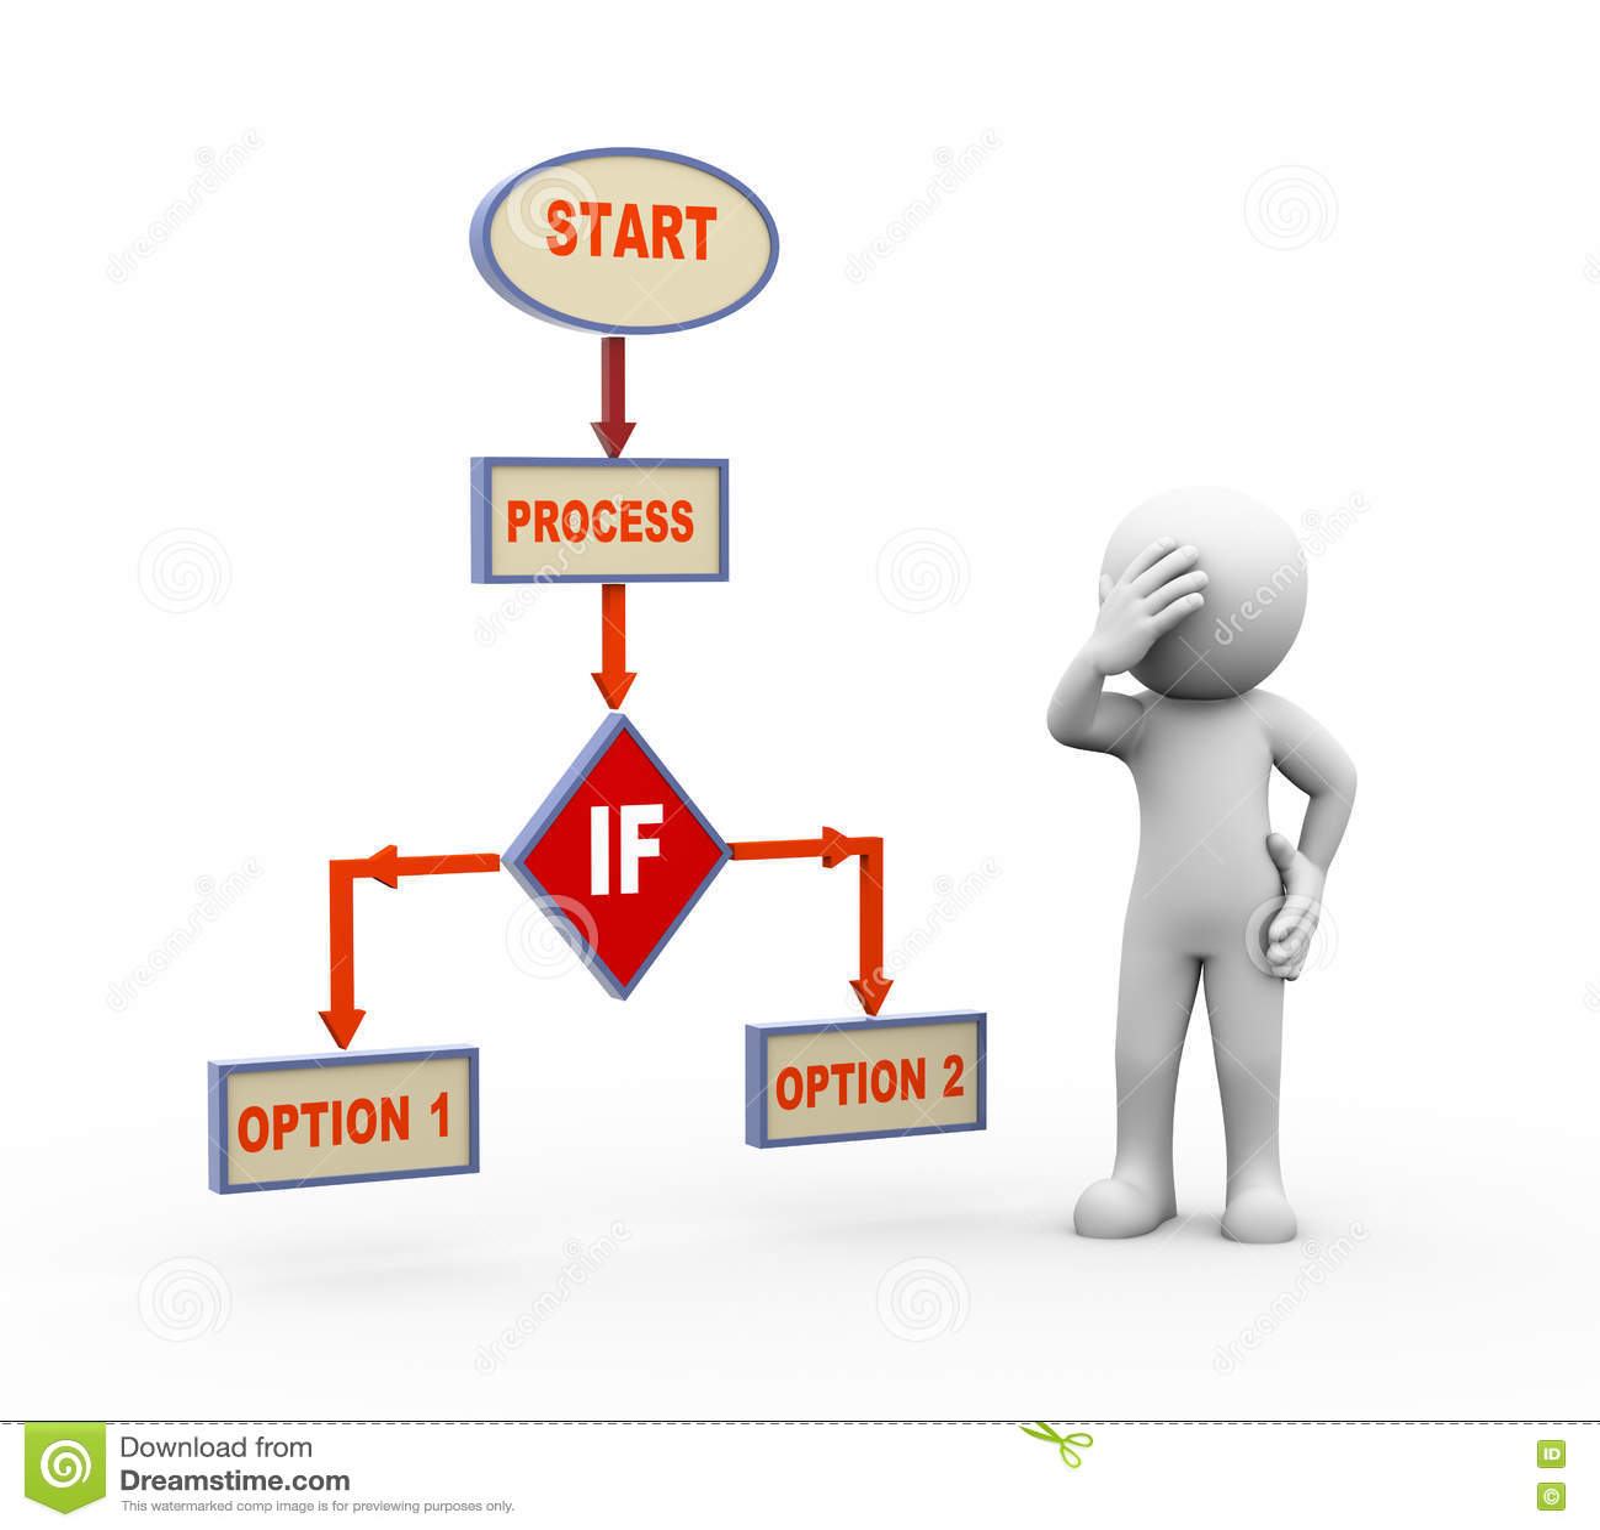 confusing process flow diagram bass guitar wiring diagrams decision maker 3 organization